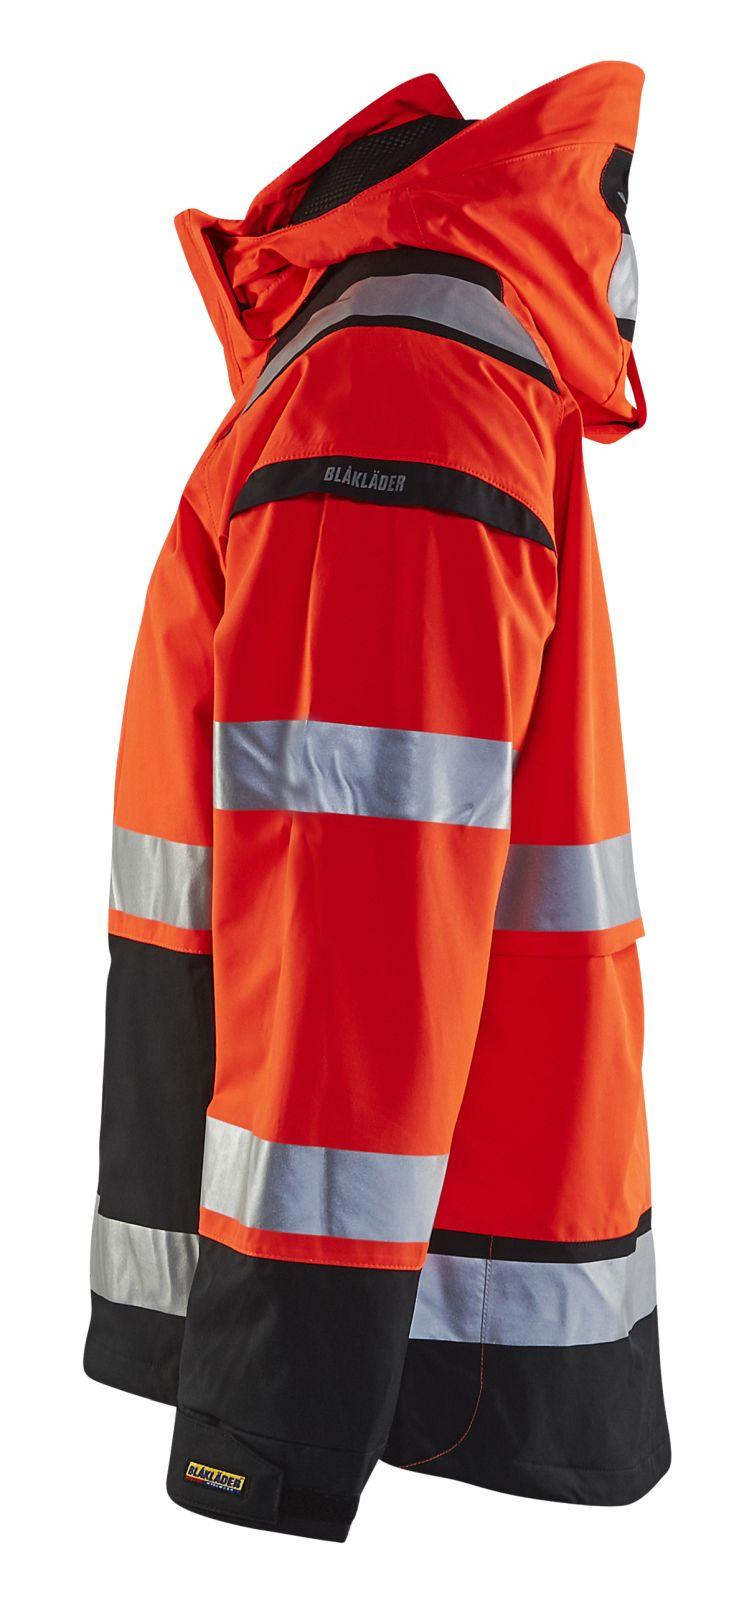 Blaklader Regenjacks 49871987 High Vis fluo rood-zwart(5599)